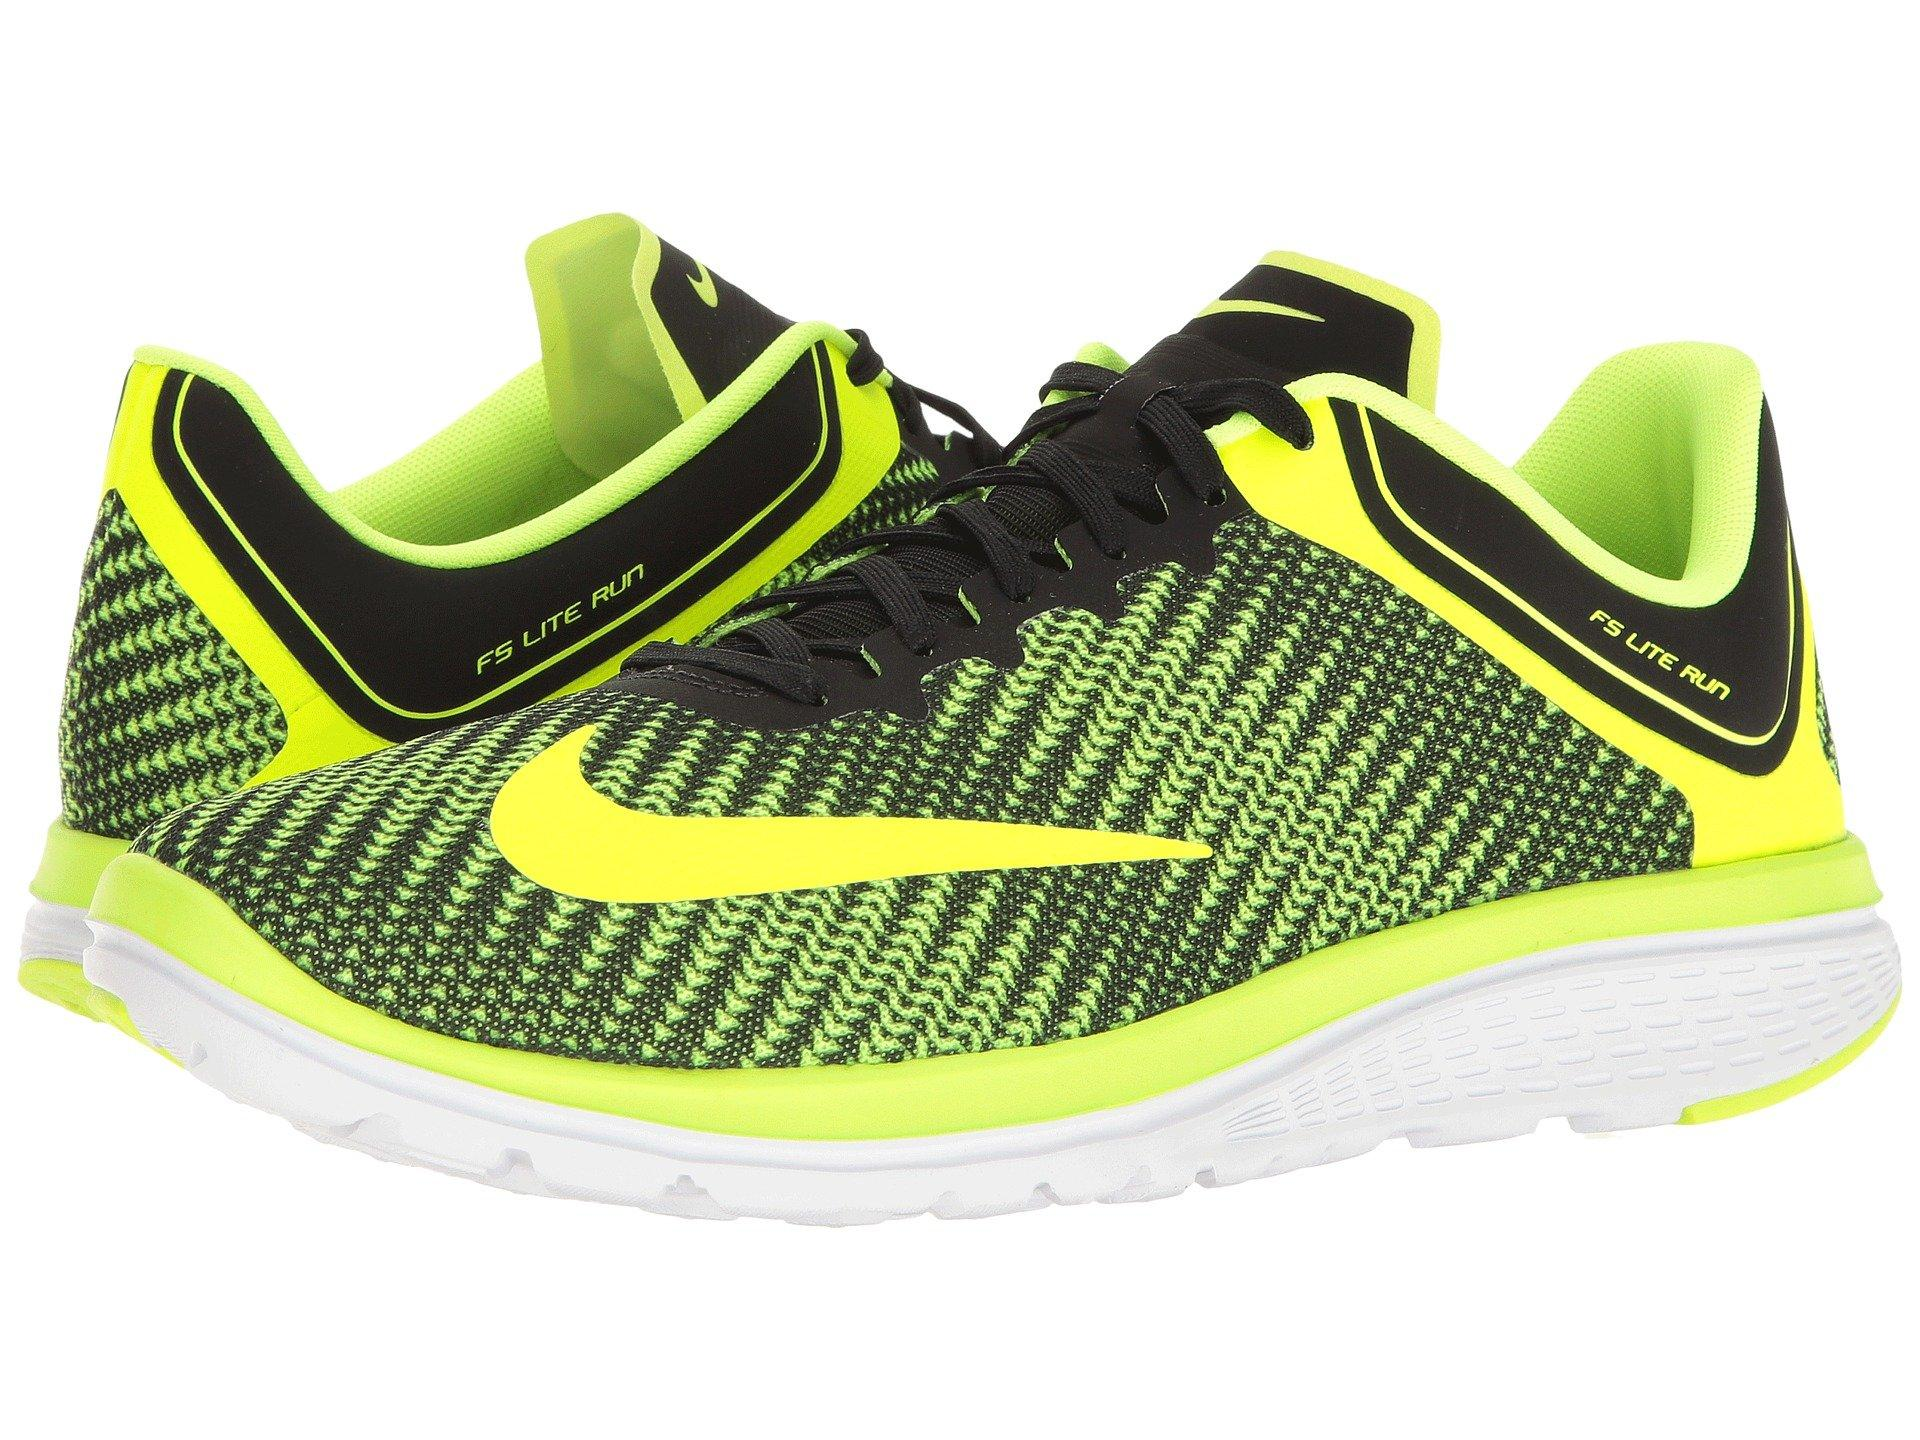 a4e17d6d696e Lyst - Nike Fs Lite Run 4 Premium in Yellow for Men